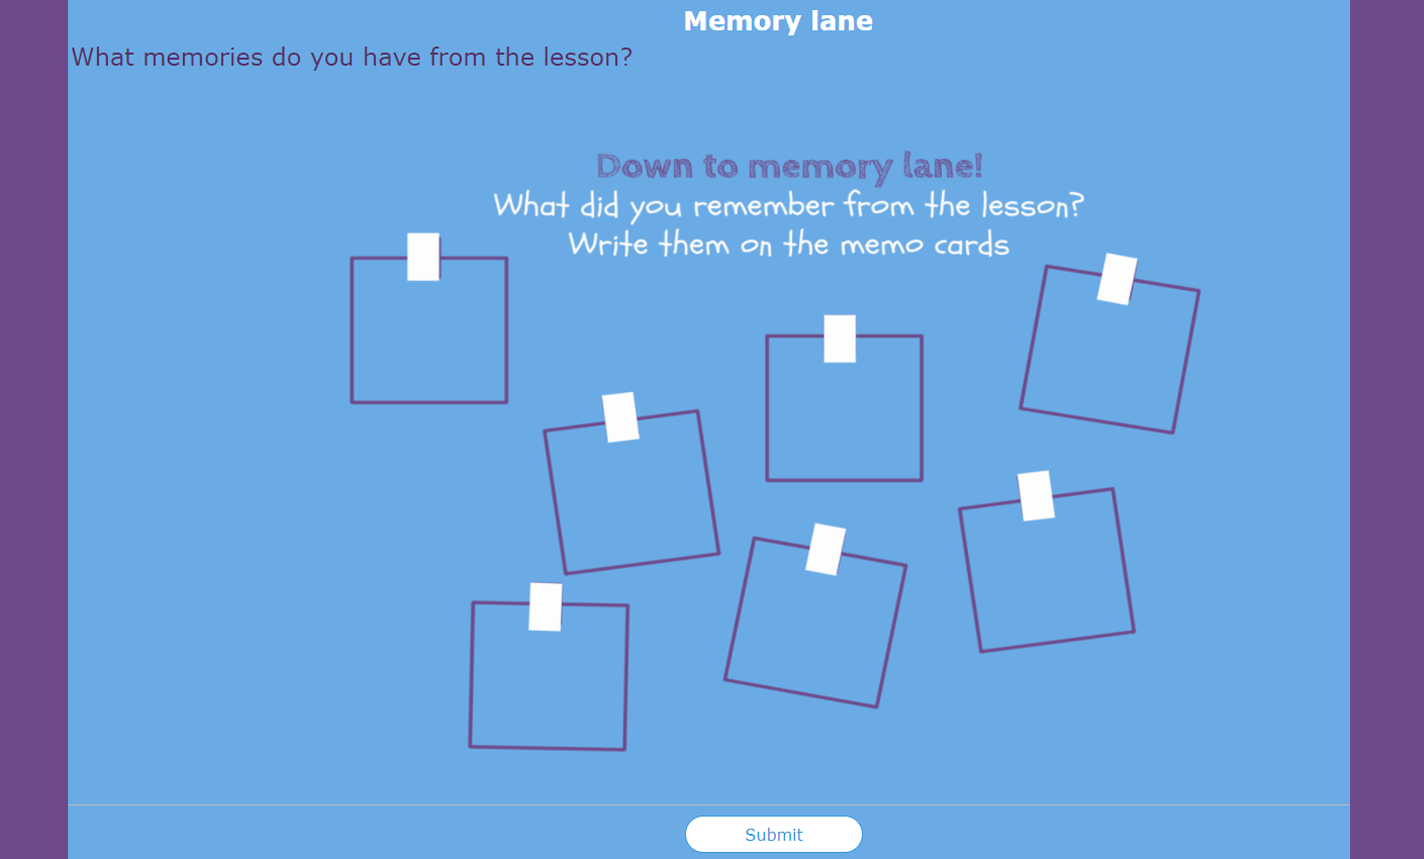 digital exit ticket - Memory lane